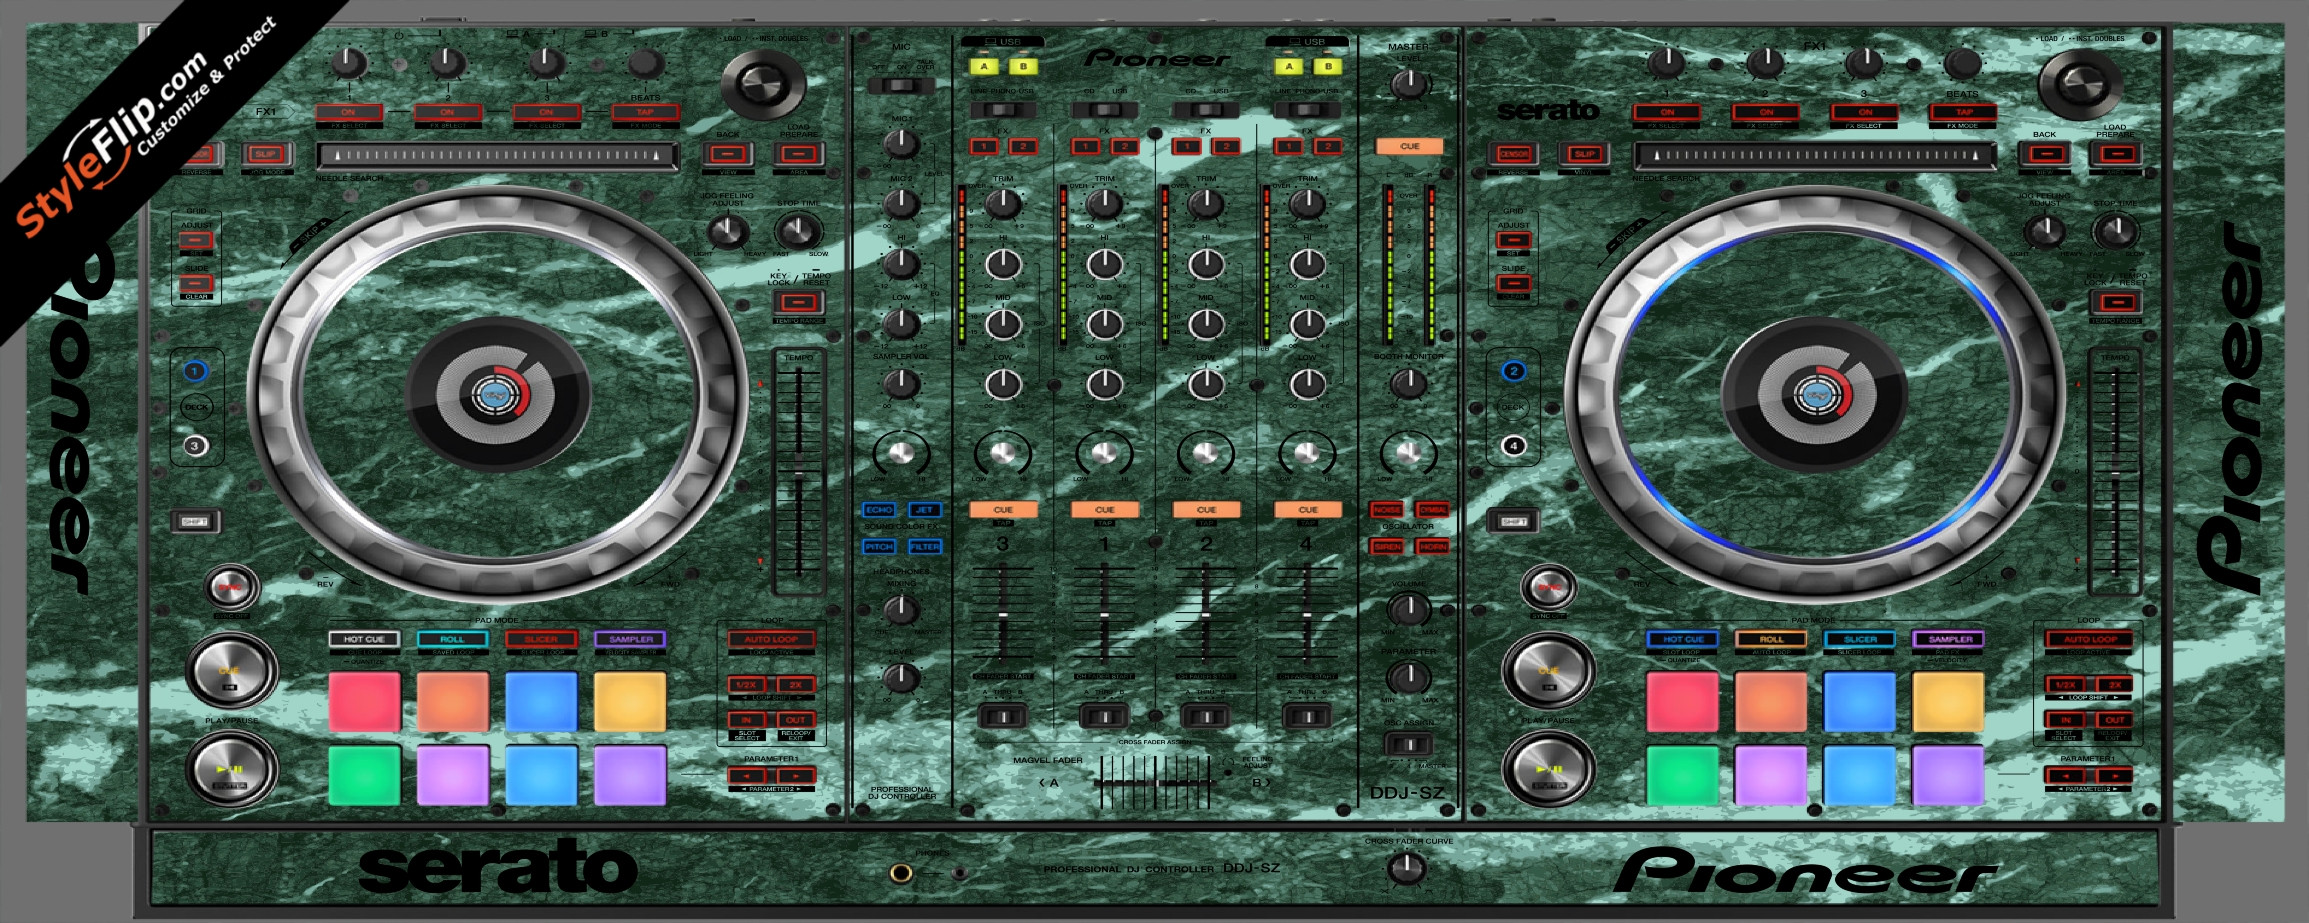 Green Marble Pioneer DDJ-SZ